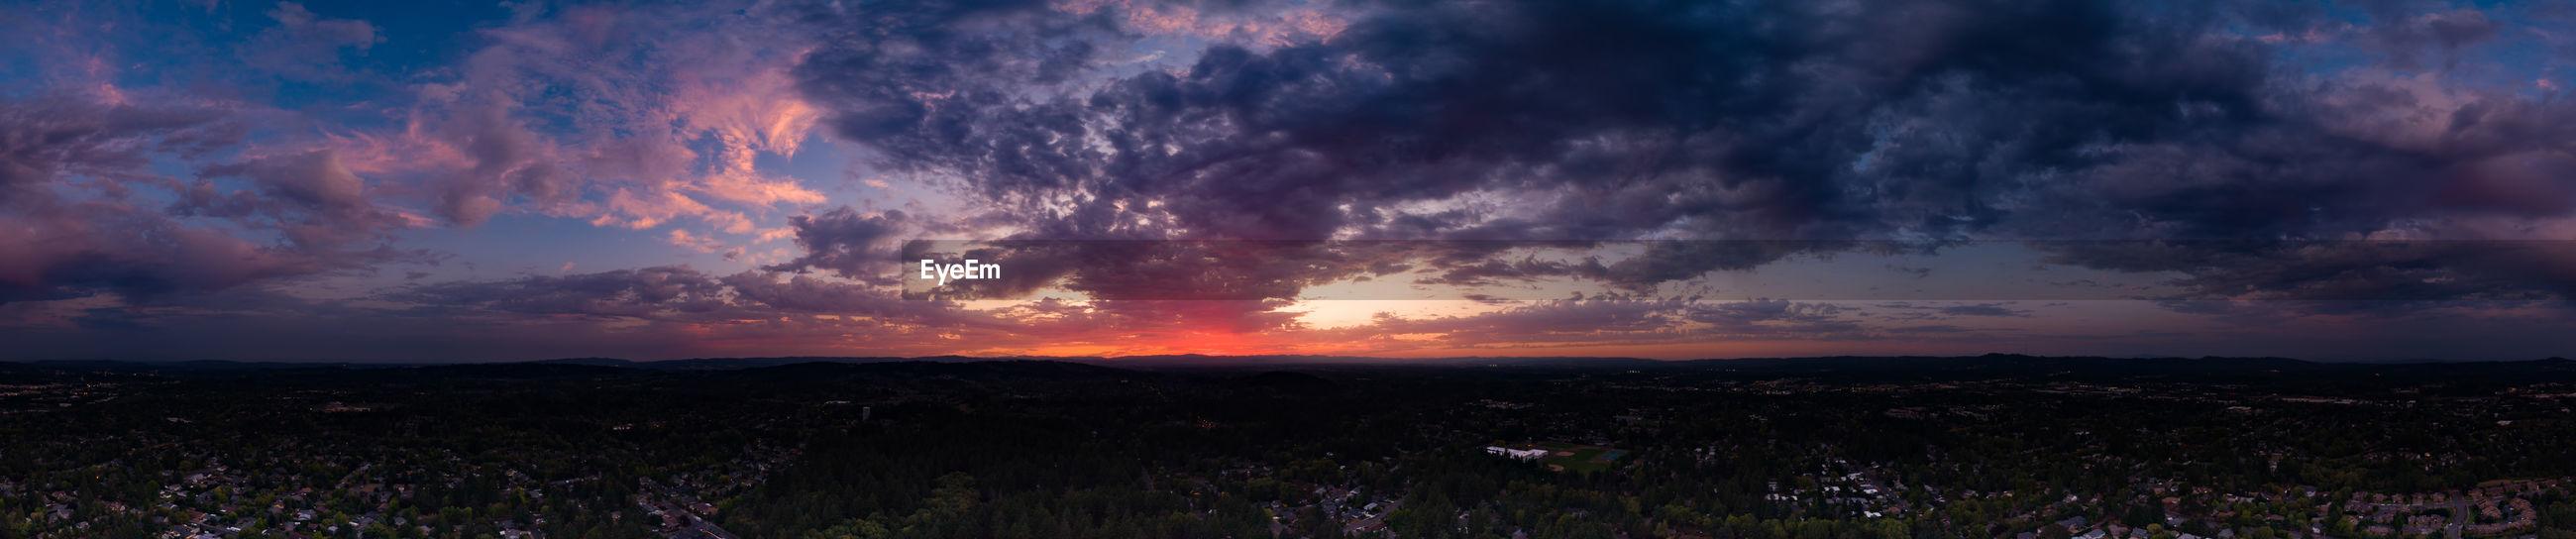 sunset Sunset Storm City Clouds And Sky Evening Oregon Beauty Panorama